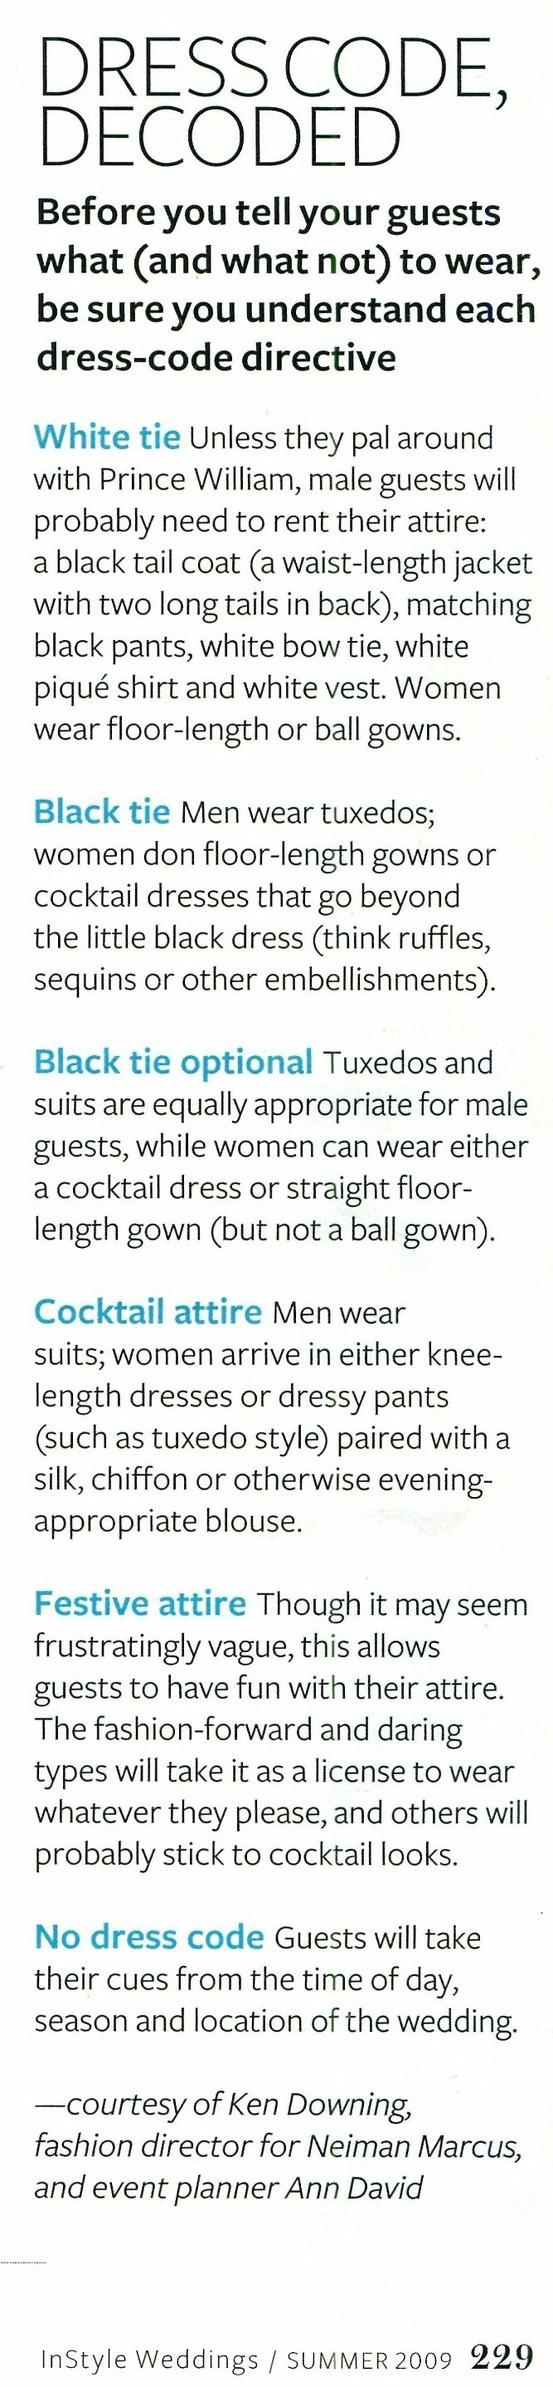 Wedding dress codes decoded